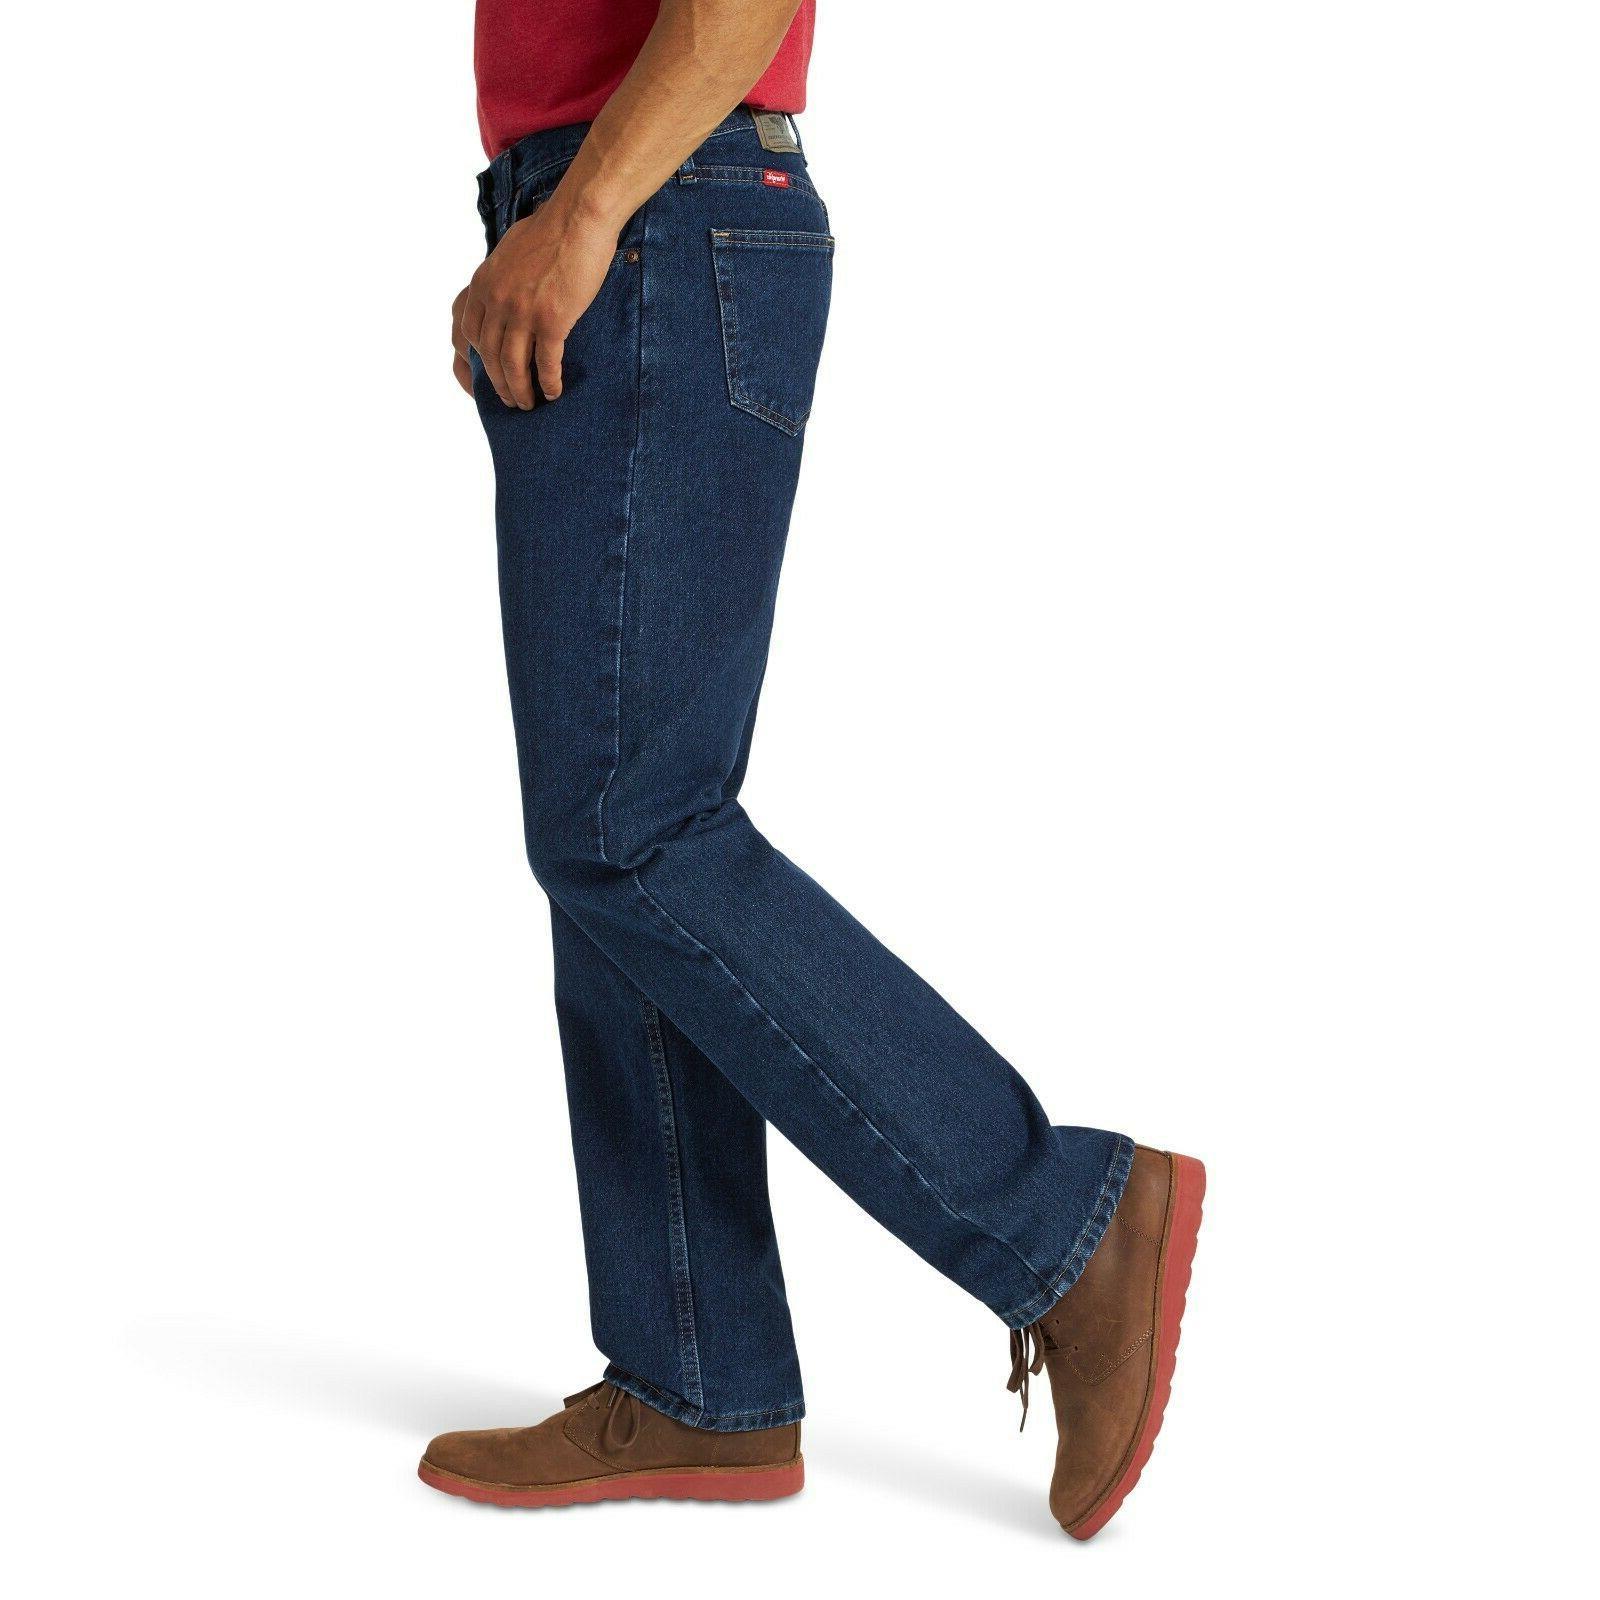 new five star premium regular fit jeans